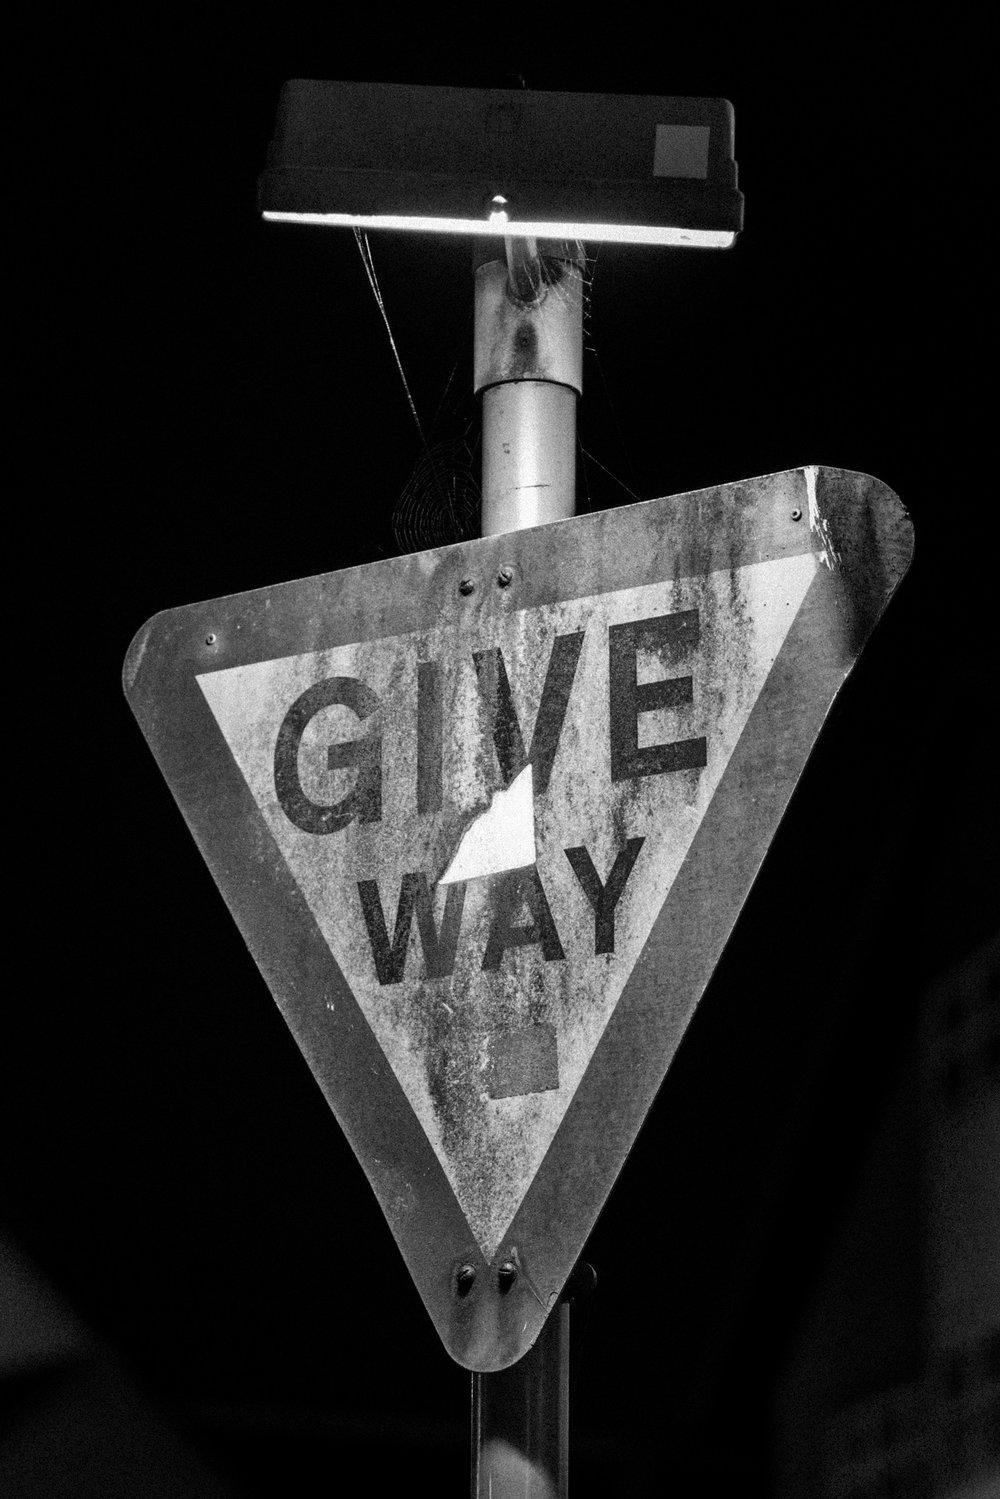 giveway.jpg